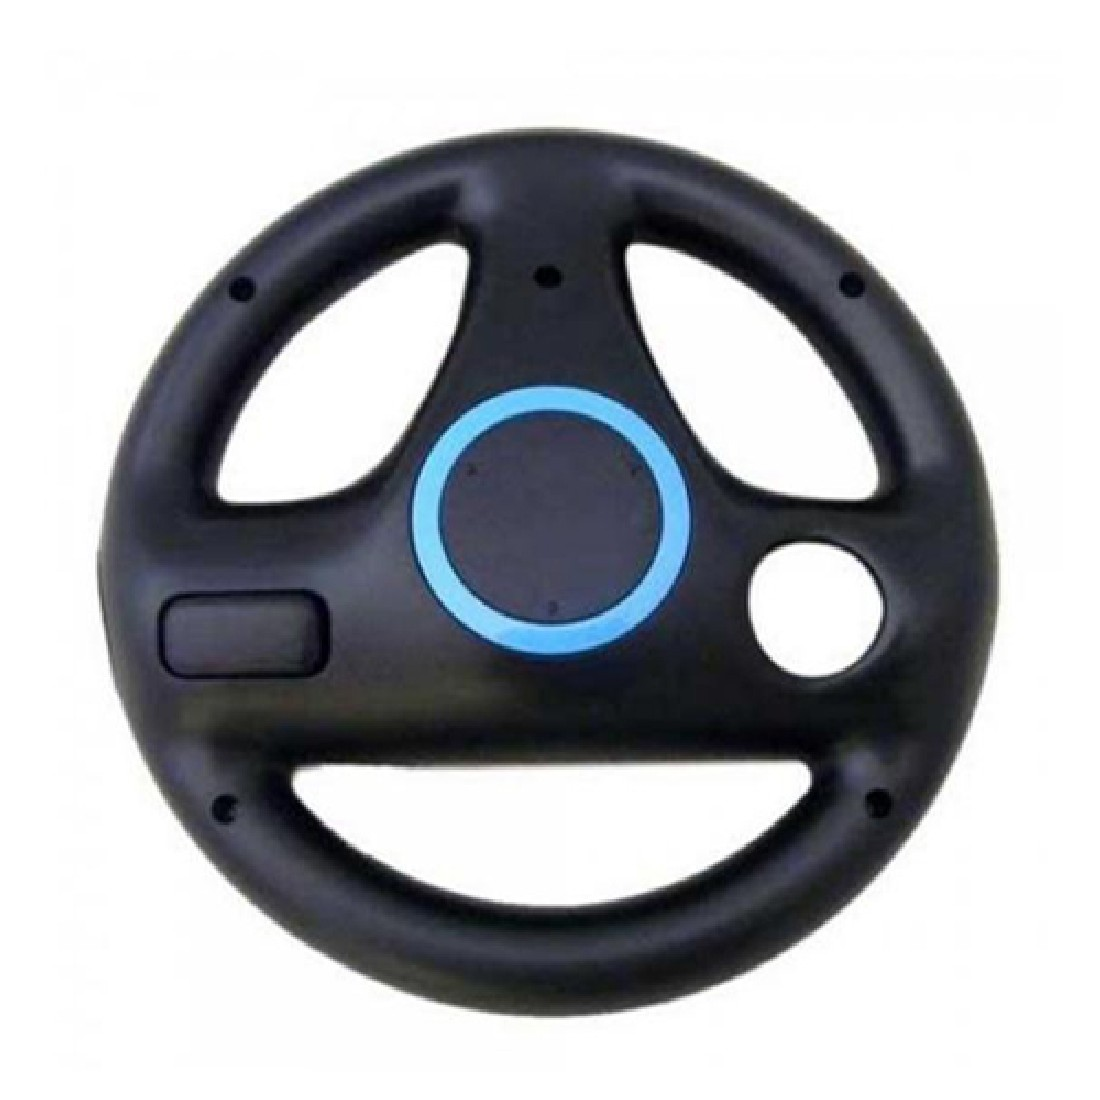 JESBERY Steering Wheel For Nintendo Wii Mario Kart Racing Top Quality Games Remote Controller